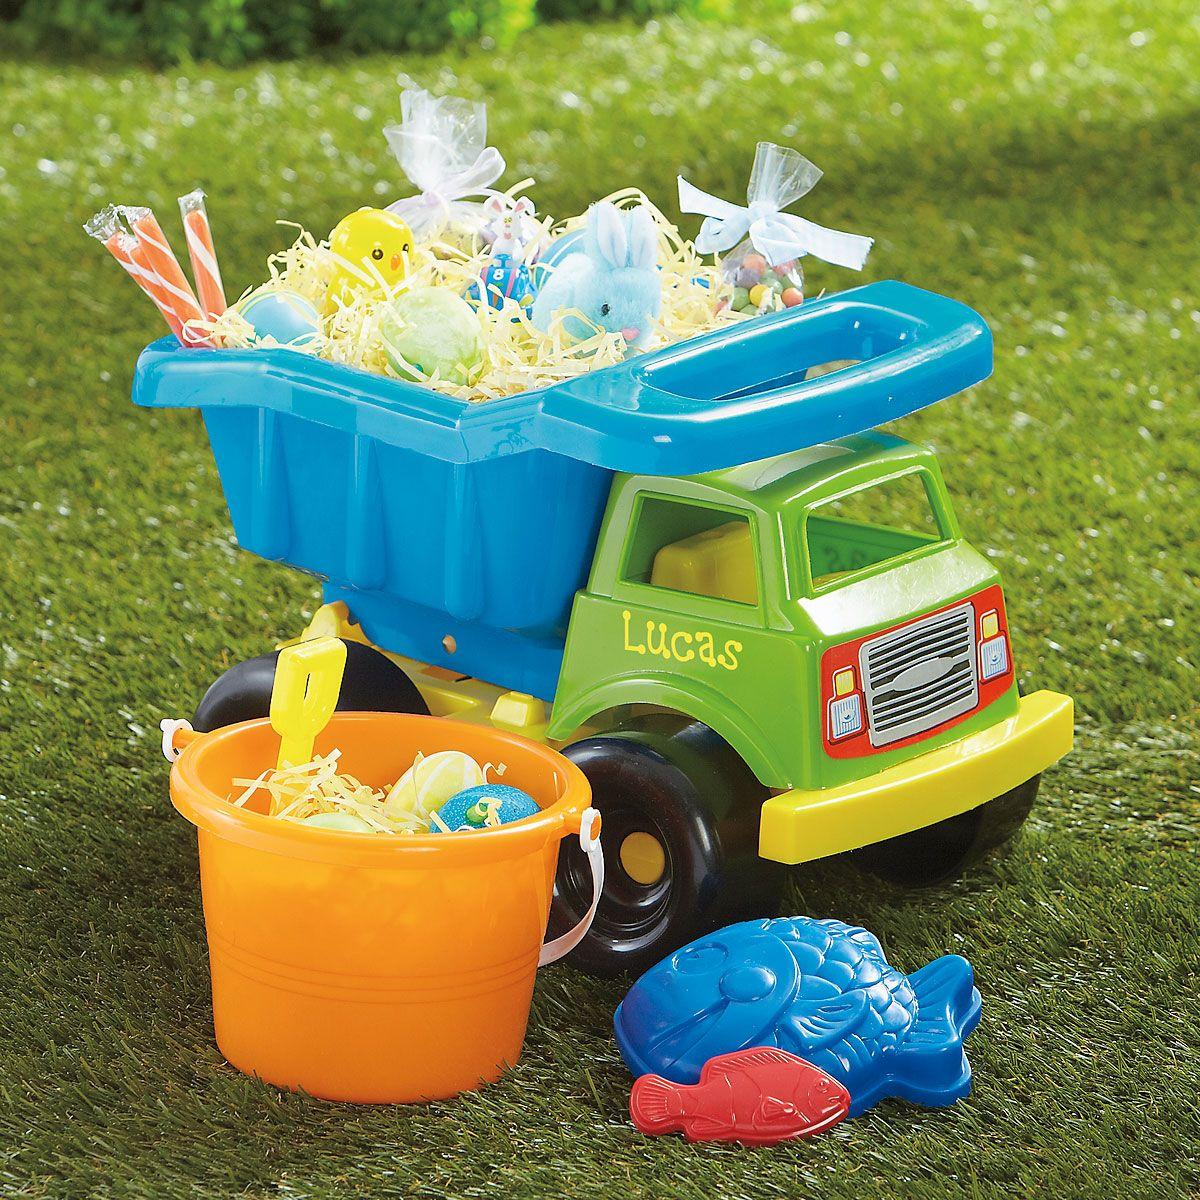 Personalized Plastic Dump Truck